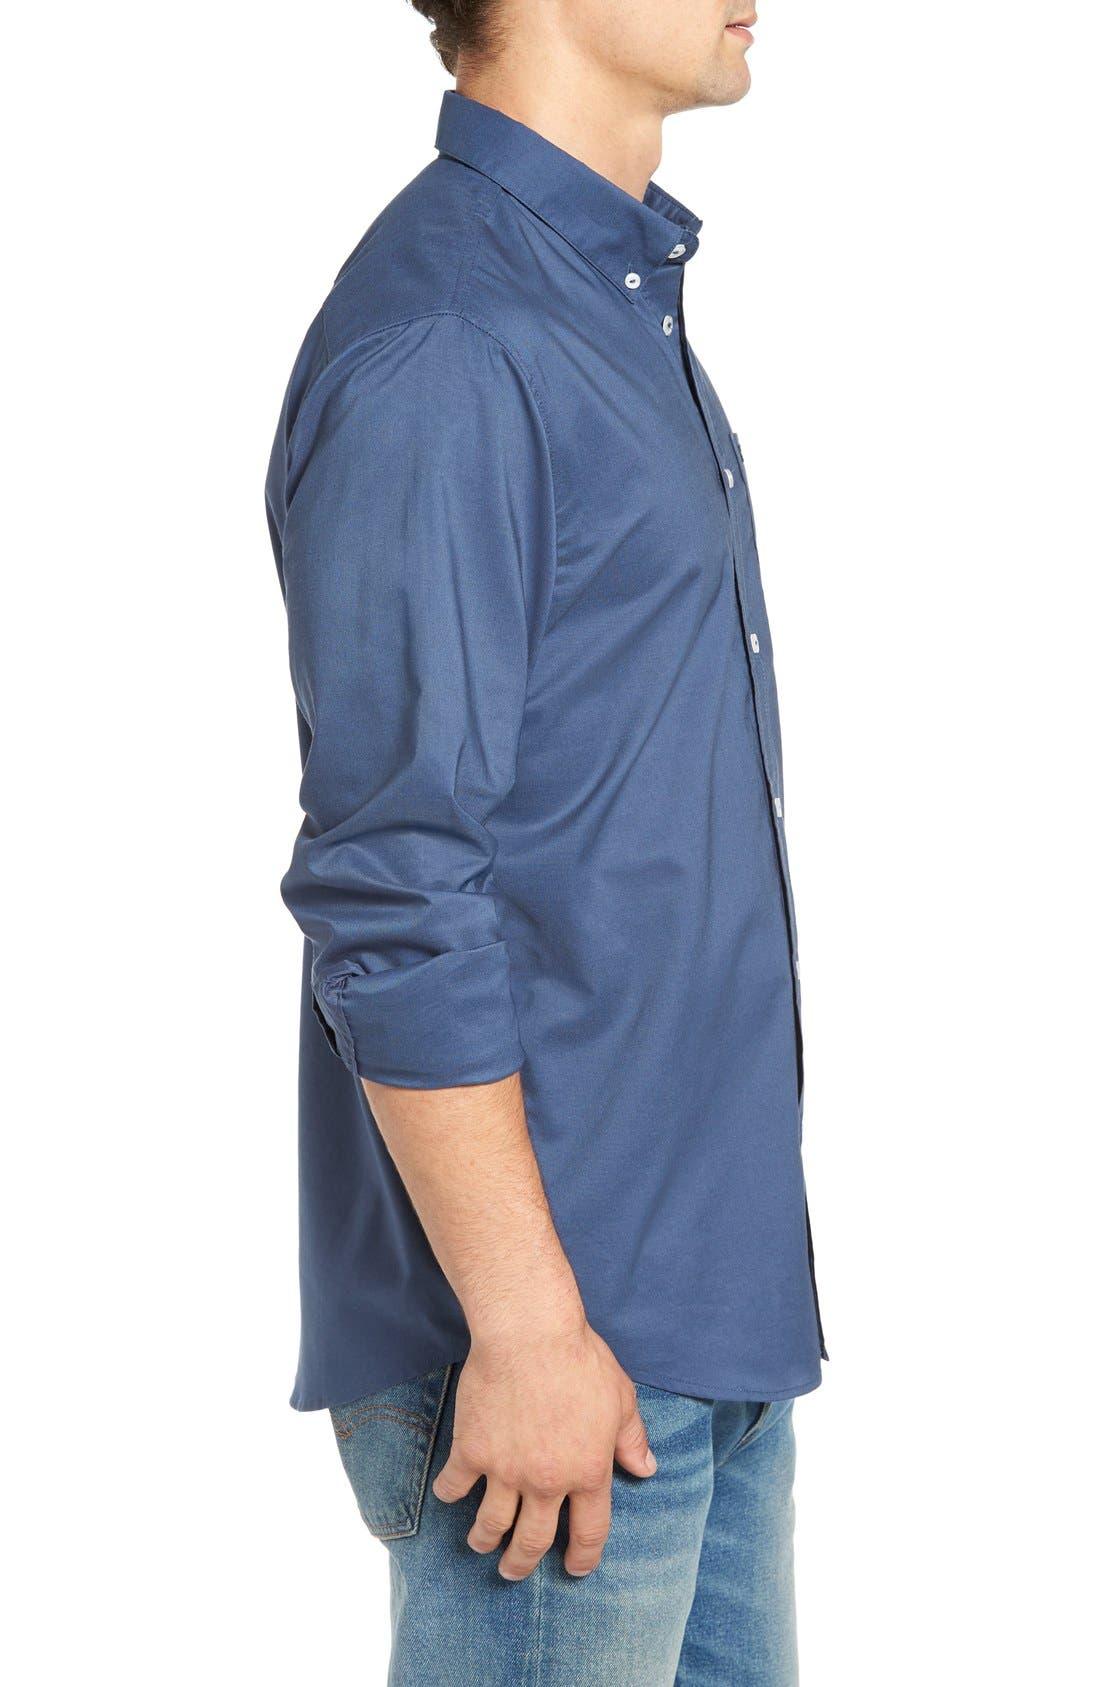 Alternate Image 3  - RVCA 'That'll Do' Slim Fit Oxford Shirt